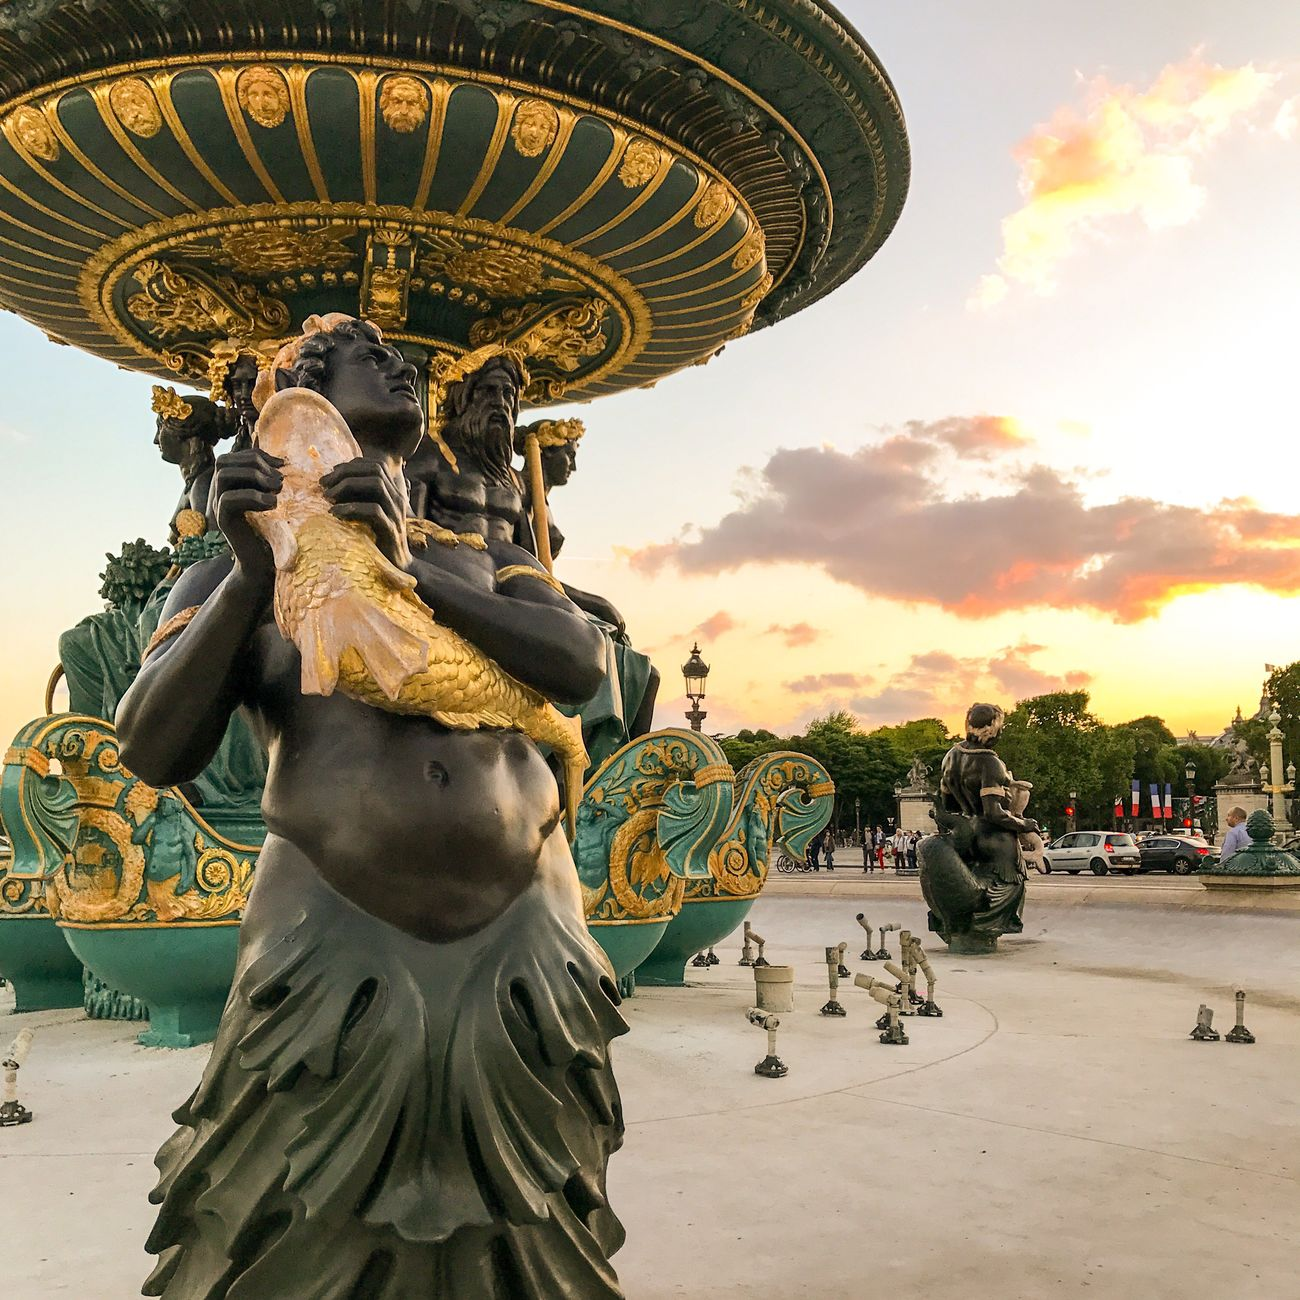 Bon dimanche! Good Morning Paris! Statue Sculpture Fountain Travel Destinations Paris ❤ Eyem Best Shot - Architecture Photooftheday Paris Parisweloveyou EyeEm Best Shots Sunset